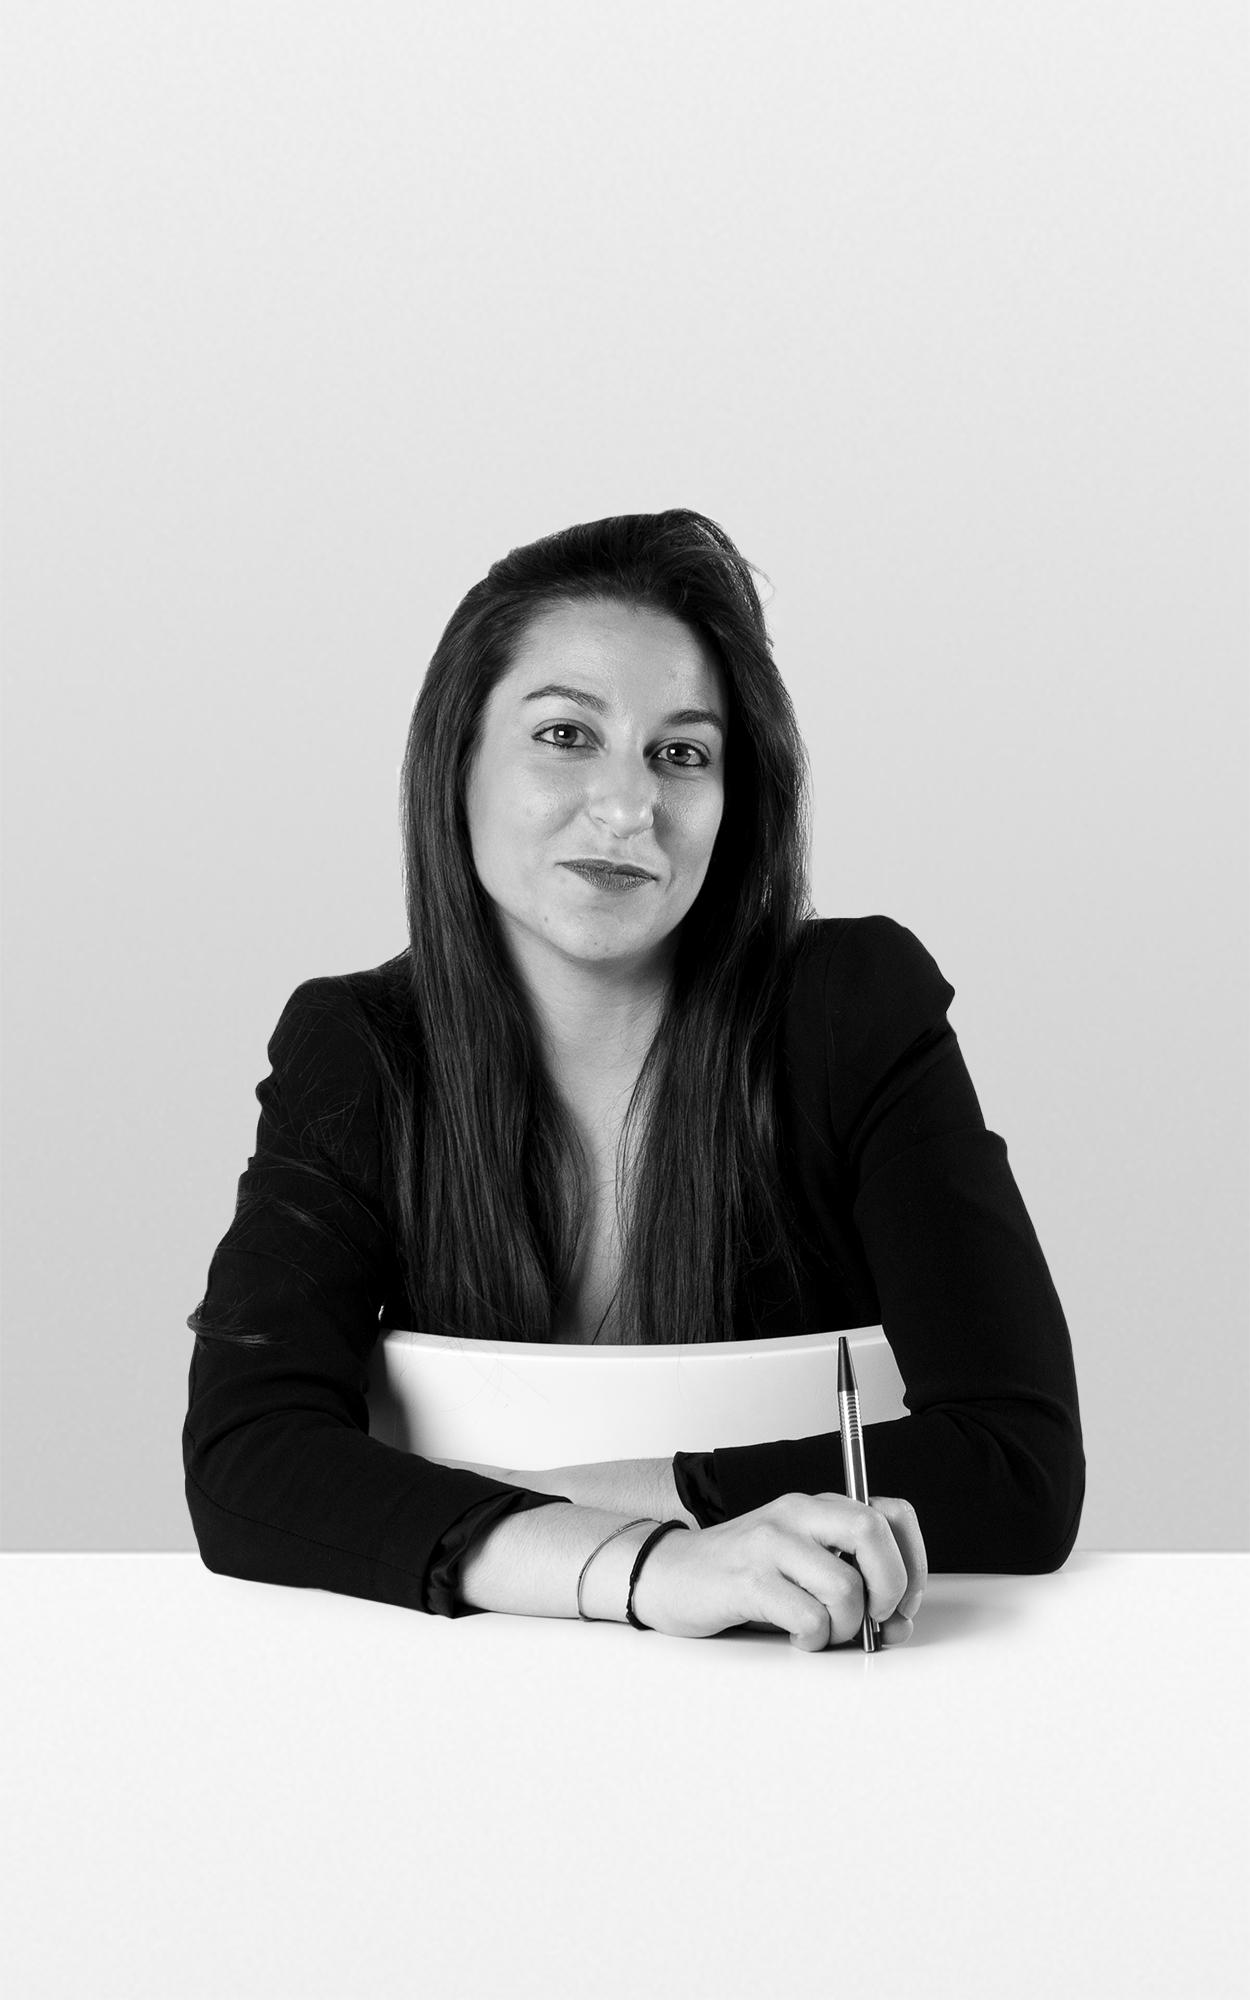 Justine Fregoni